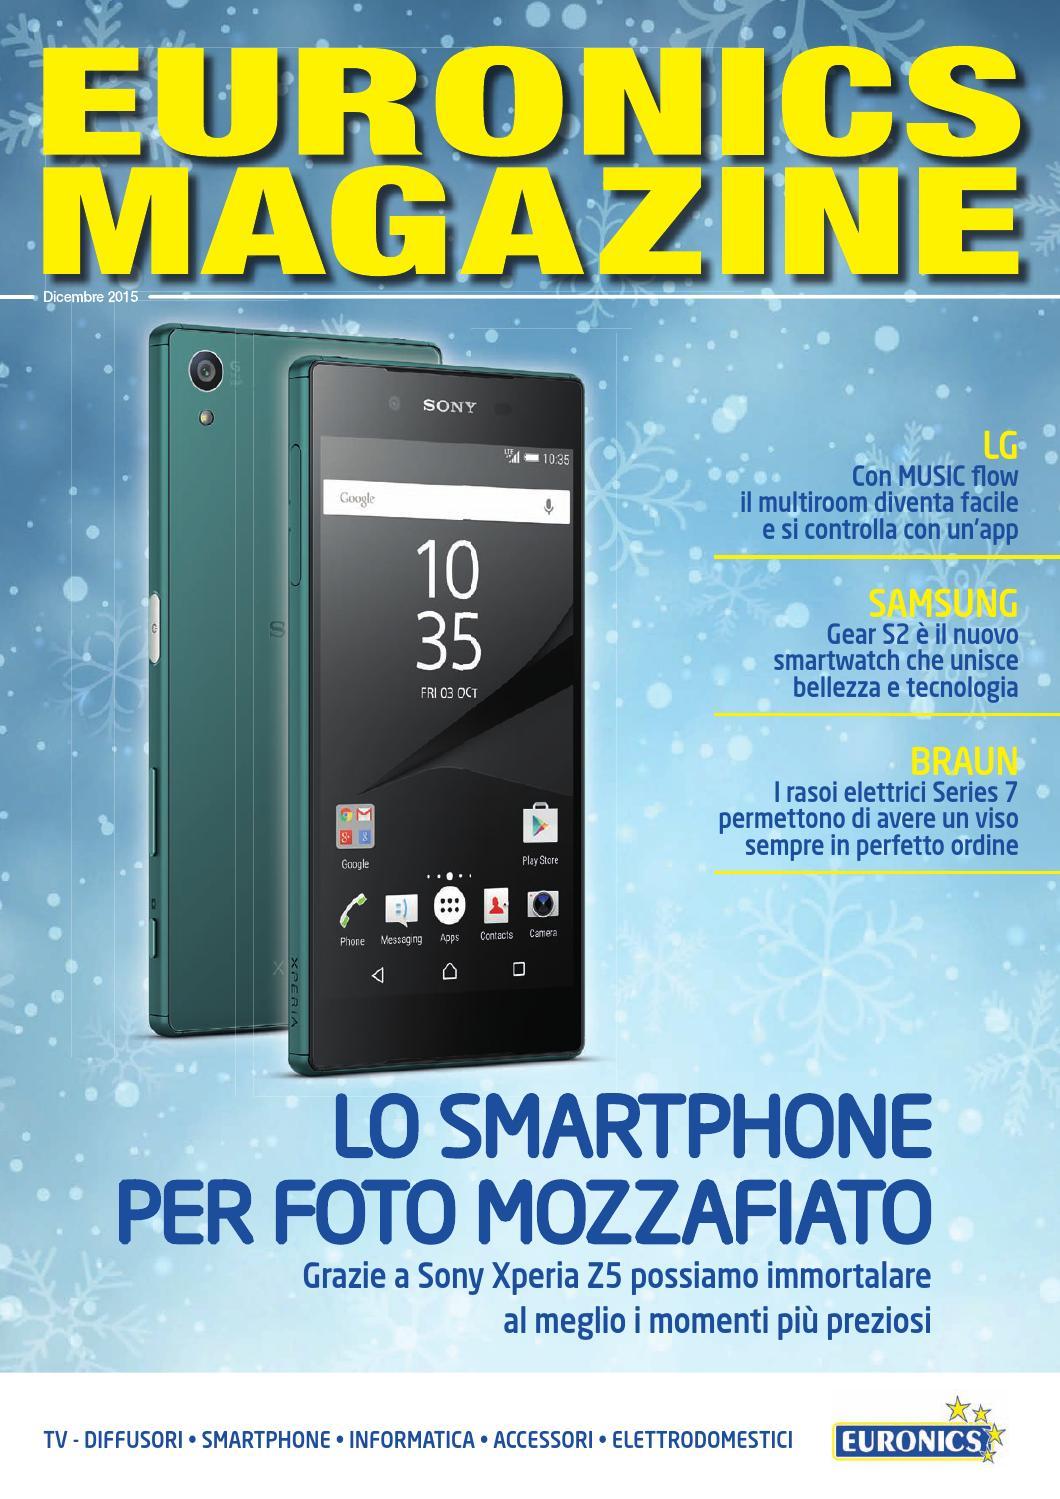 01 28 - Euronics Magazine by euronics italia spa - issuu c42b67e51543